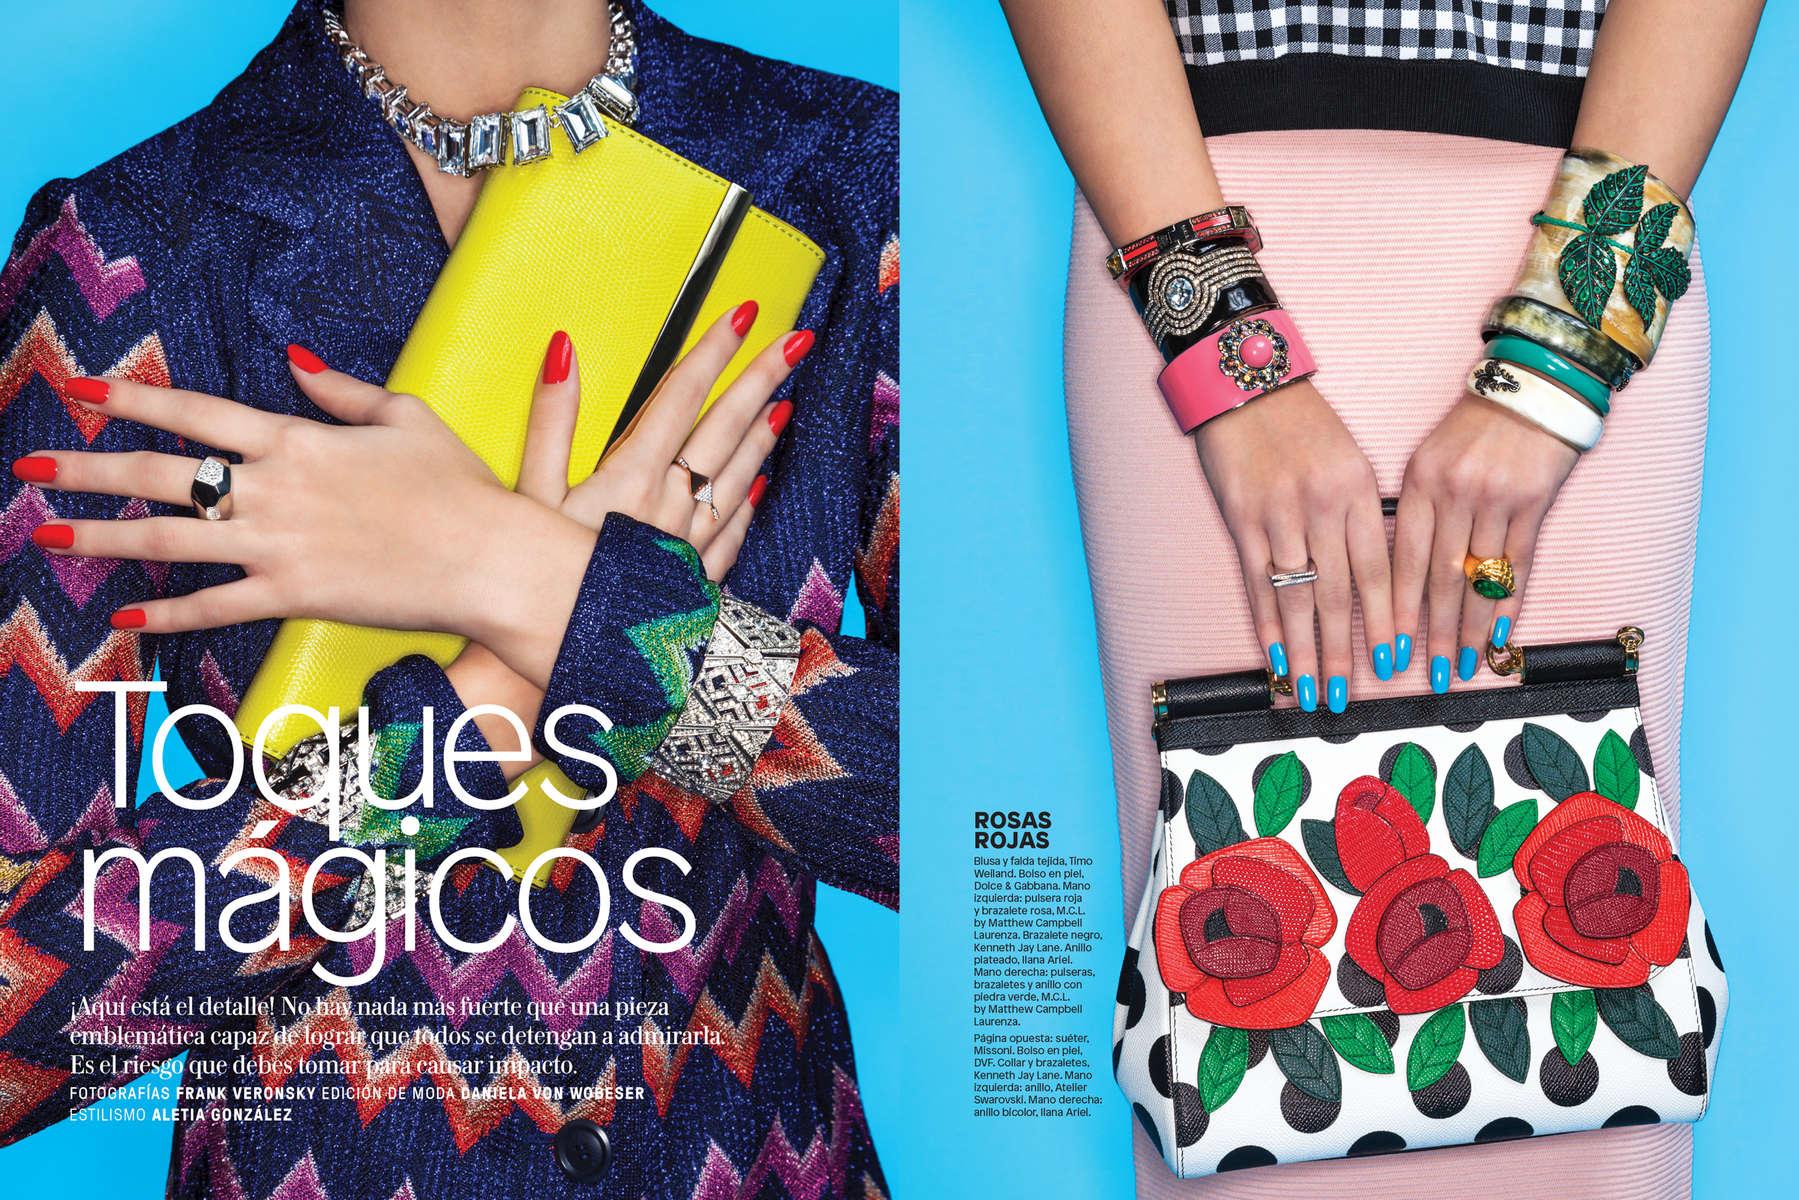 glamour-magazine-accessories-spring--frankveronsky3